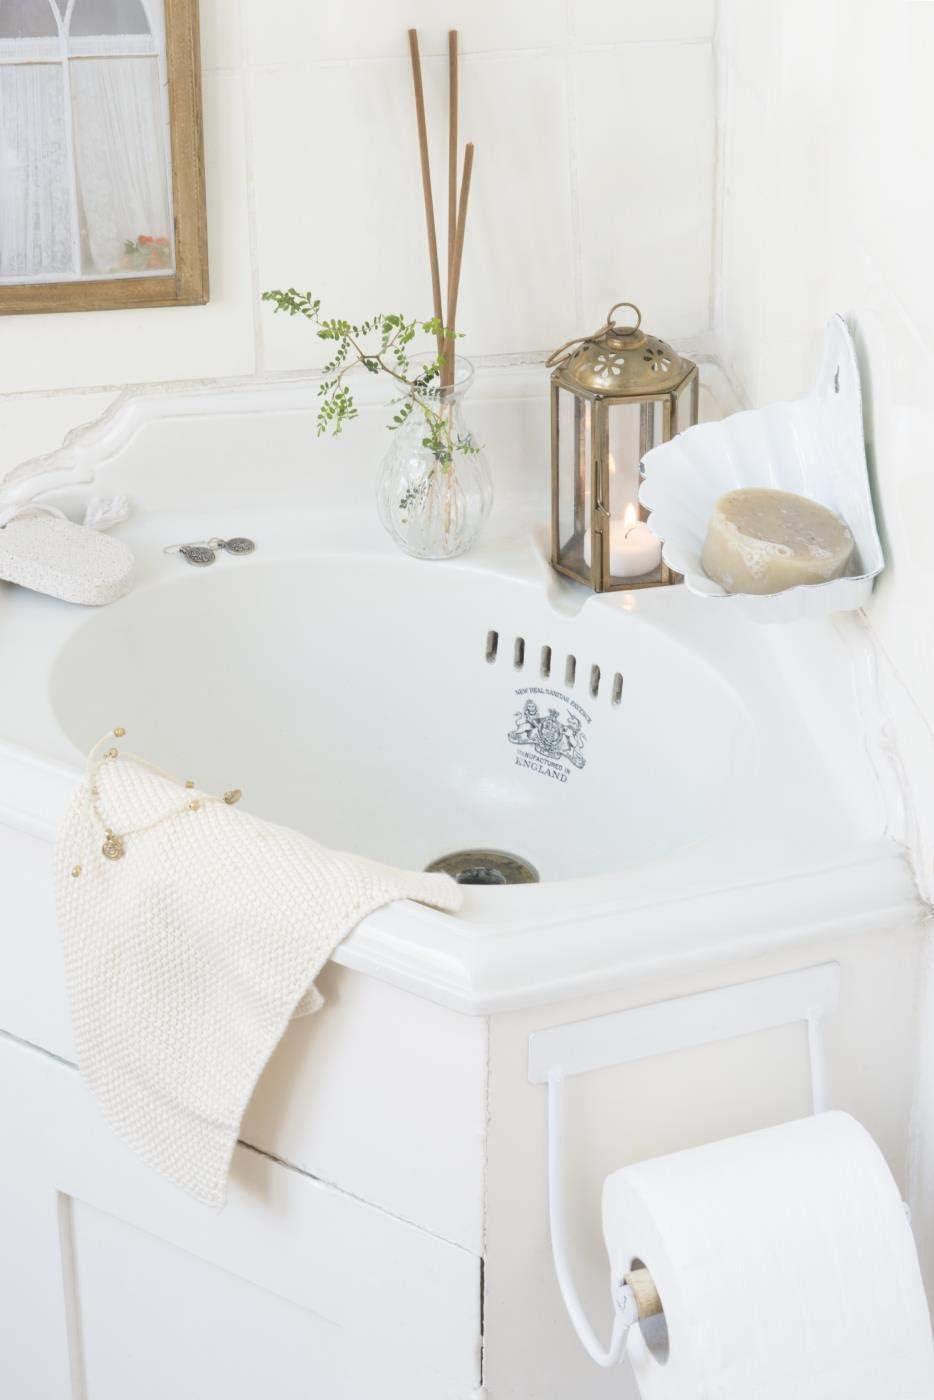 Toilettenpapierhalter m//Holzrolle